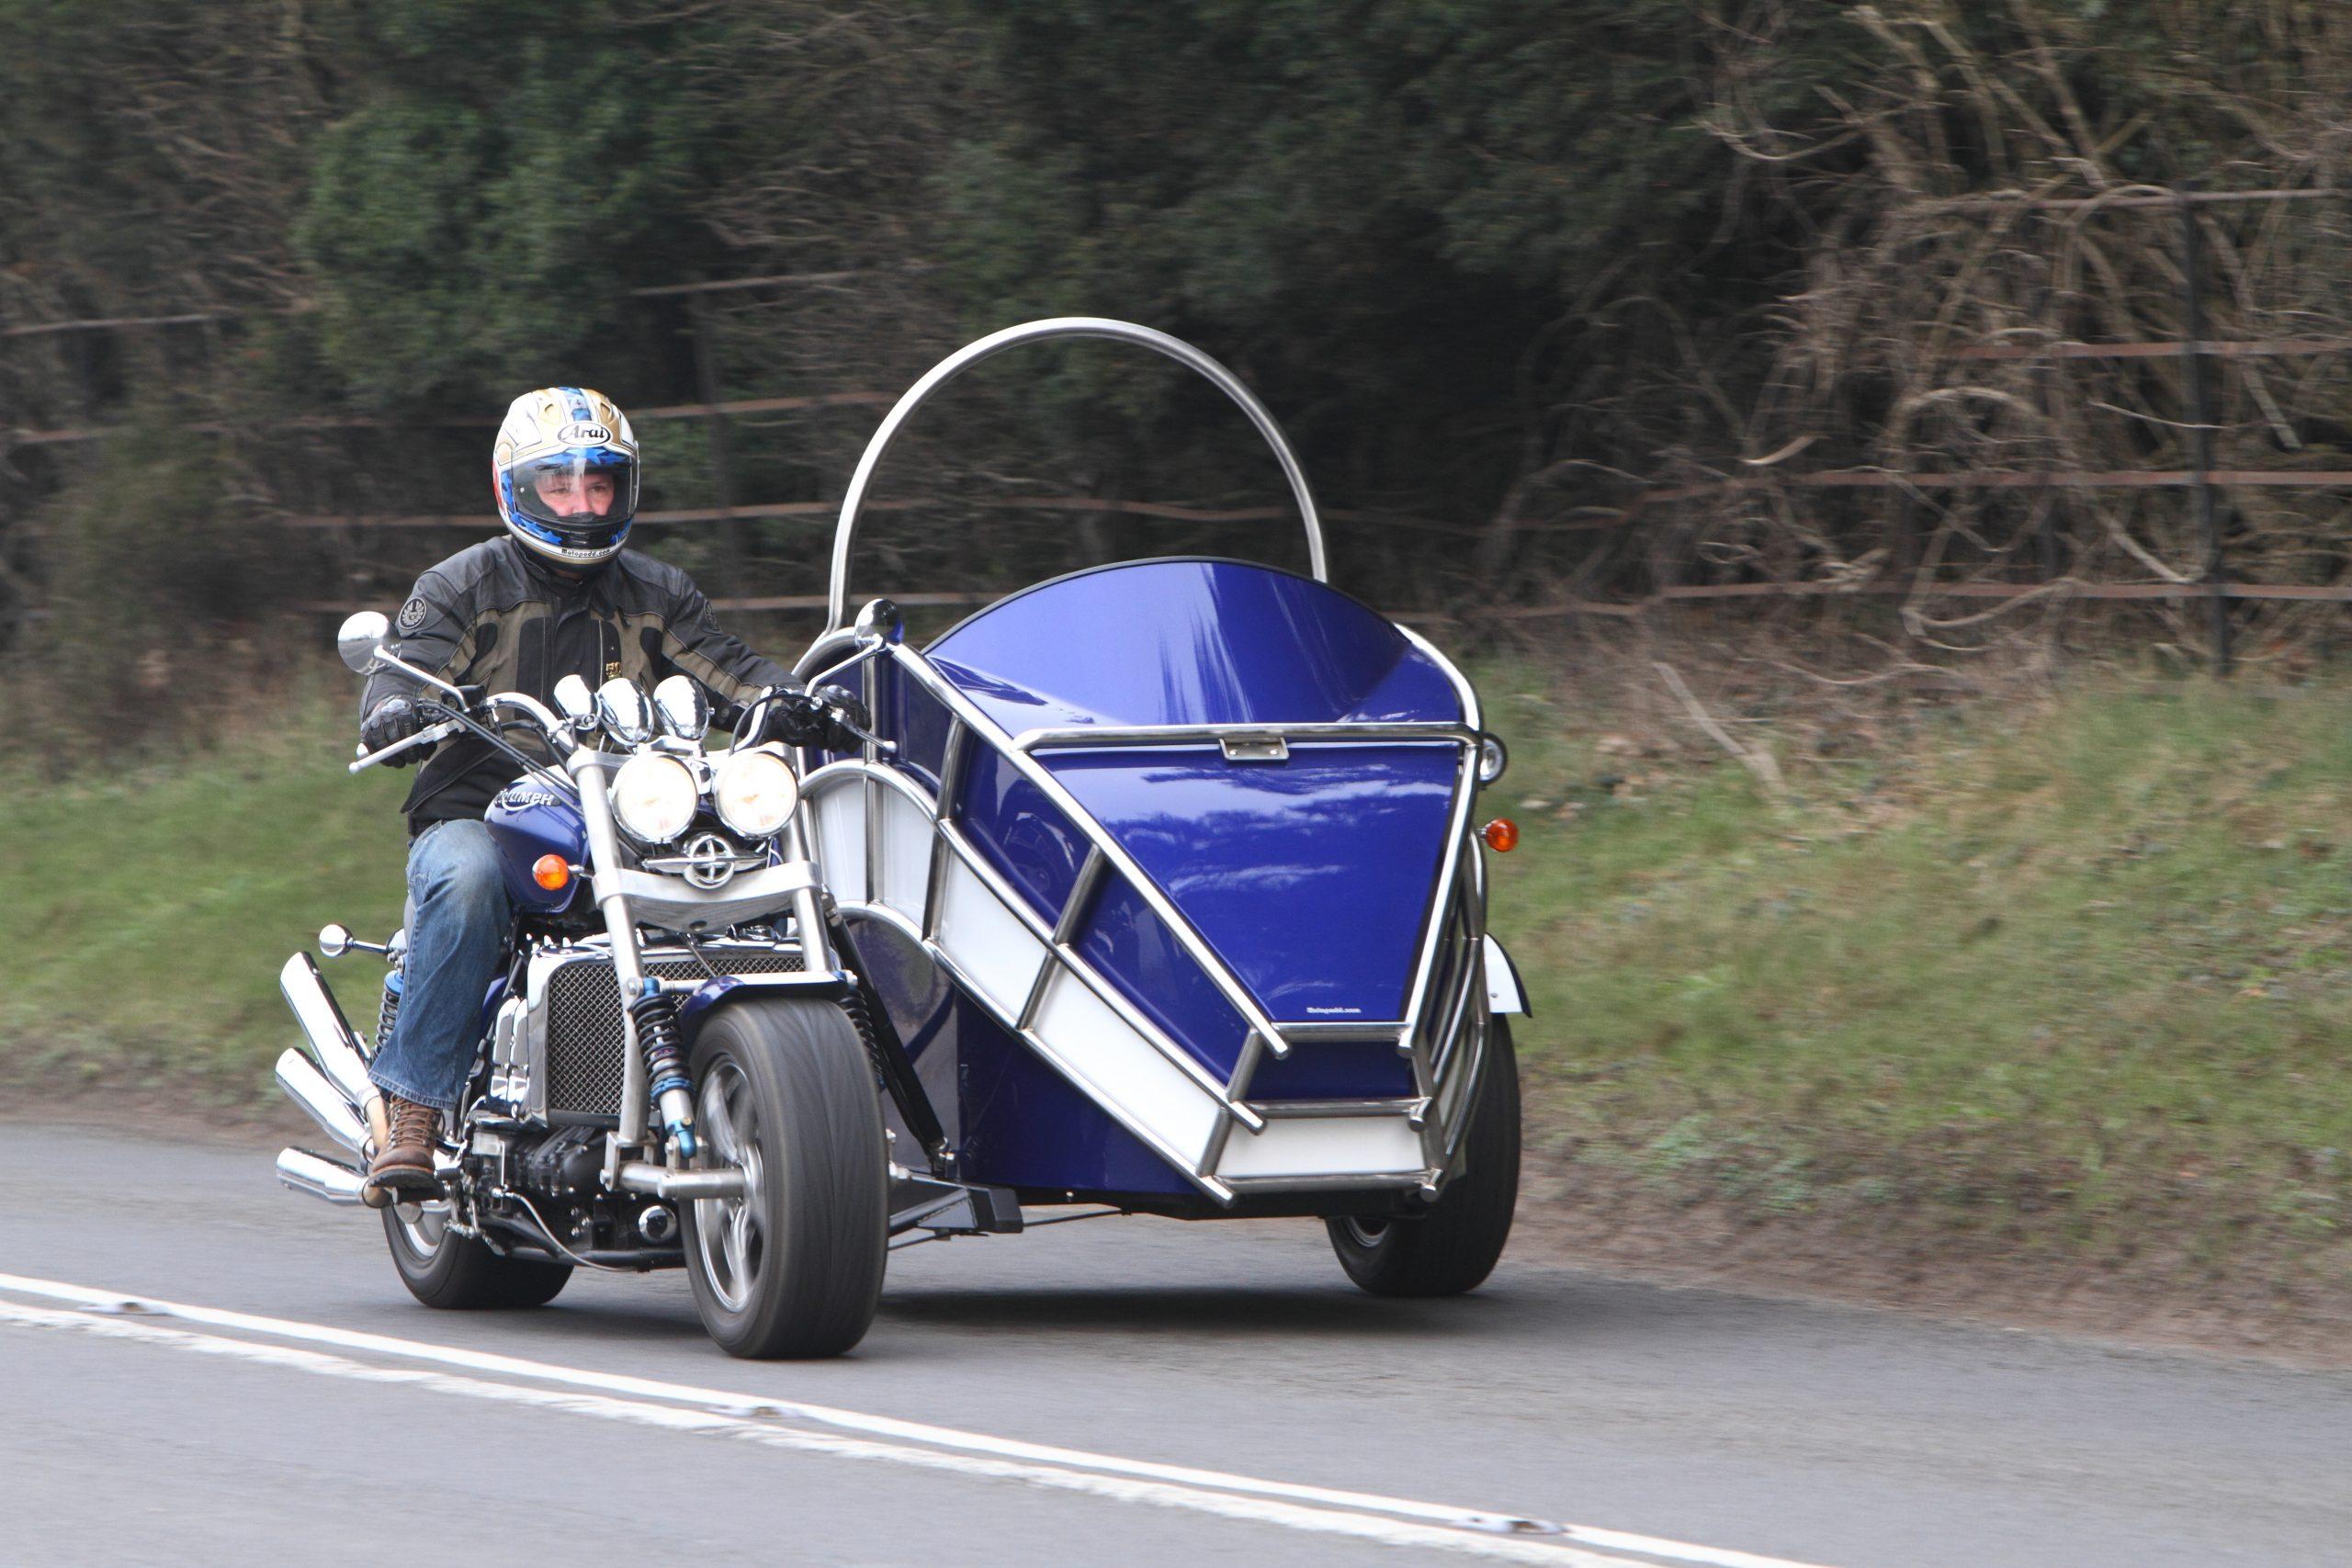 Motorbike types, Sidecar